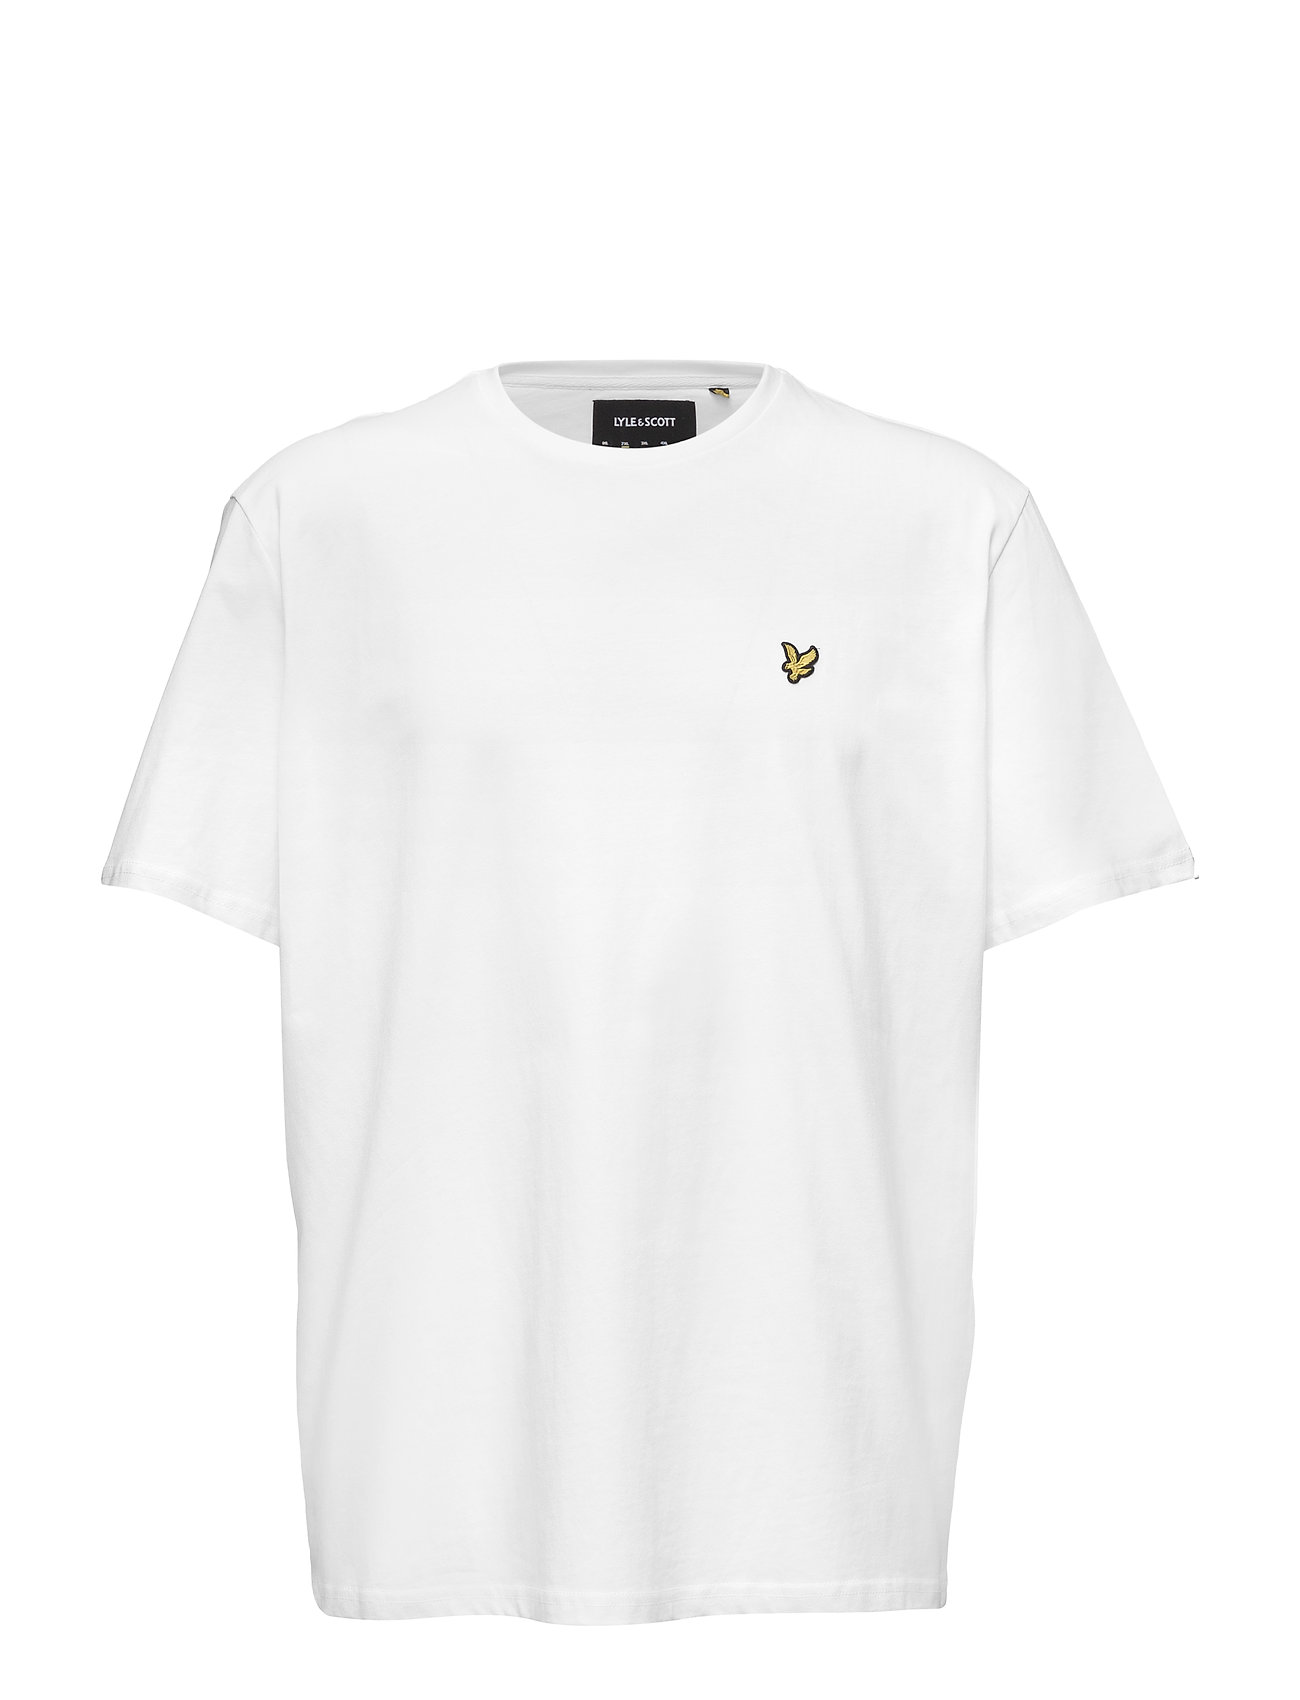 Lyle & Scott Crew Neck T-Shirt - WHITE